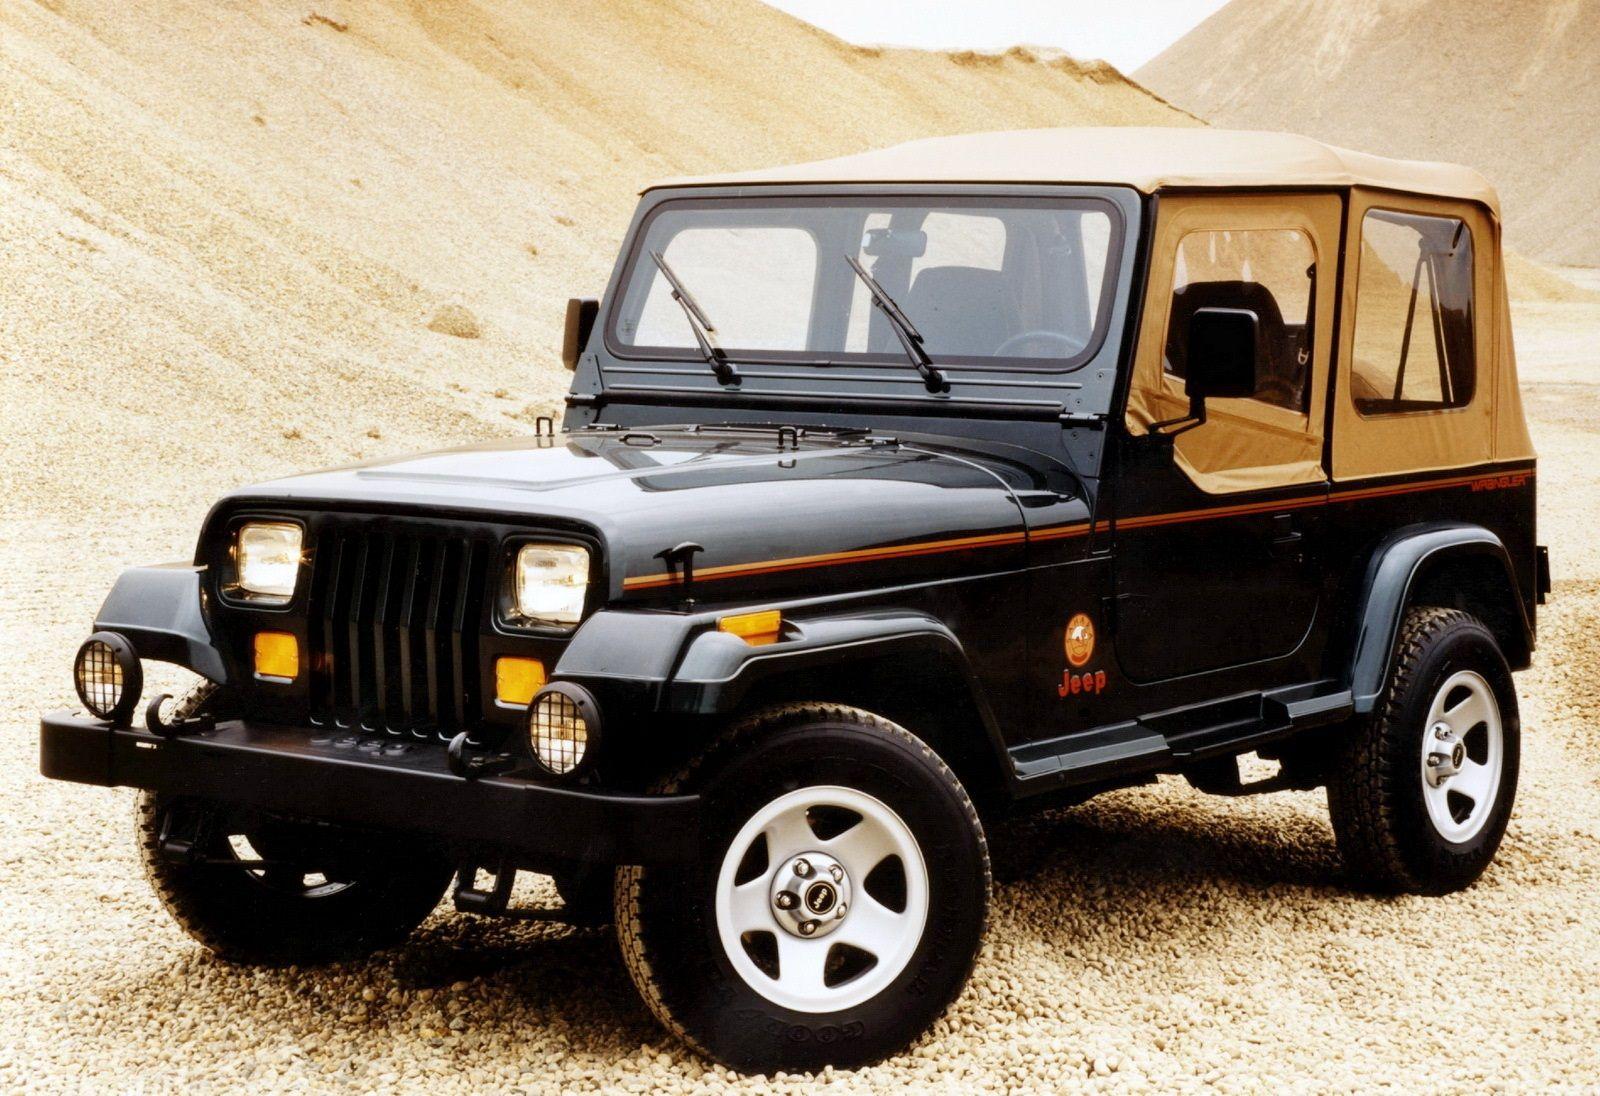 1991 To 1995 Jeep Wrangler Yj Suvs For Sale Vehiculos Autos